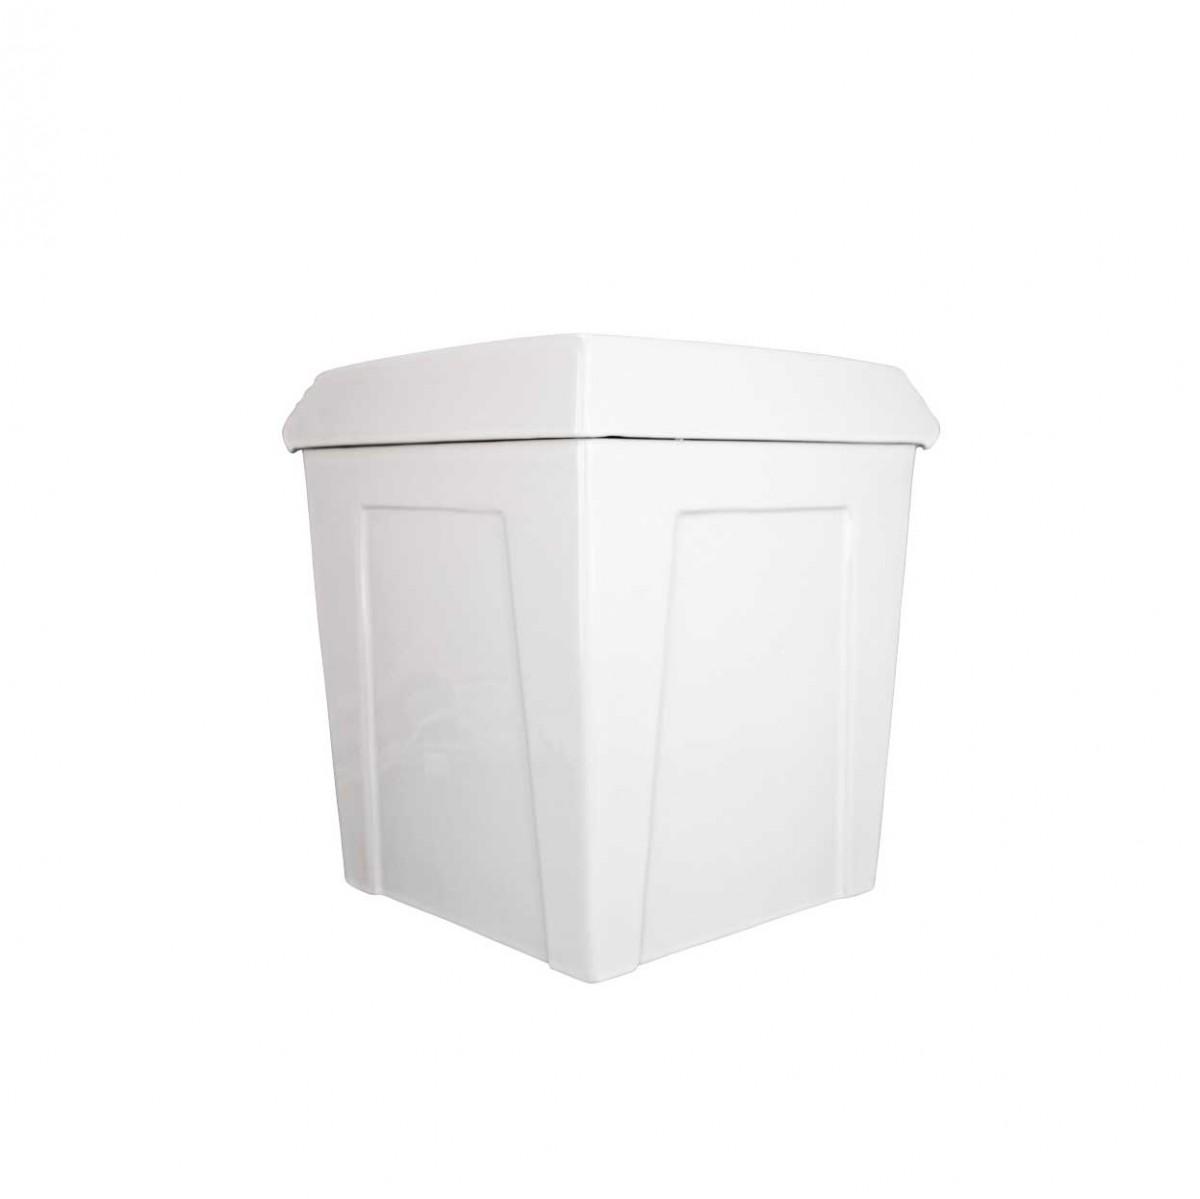 Dual Flush Round Two Piece Corner Bathroom Toilet White Ceramic Space Saving Modern Round Toilet Corner Ceramic Toilet Dual Flush Toilet